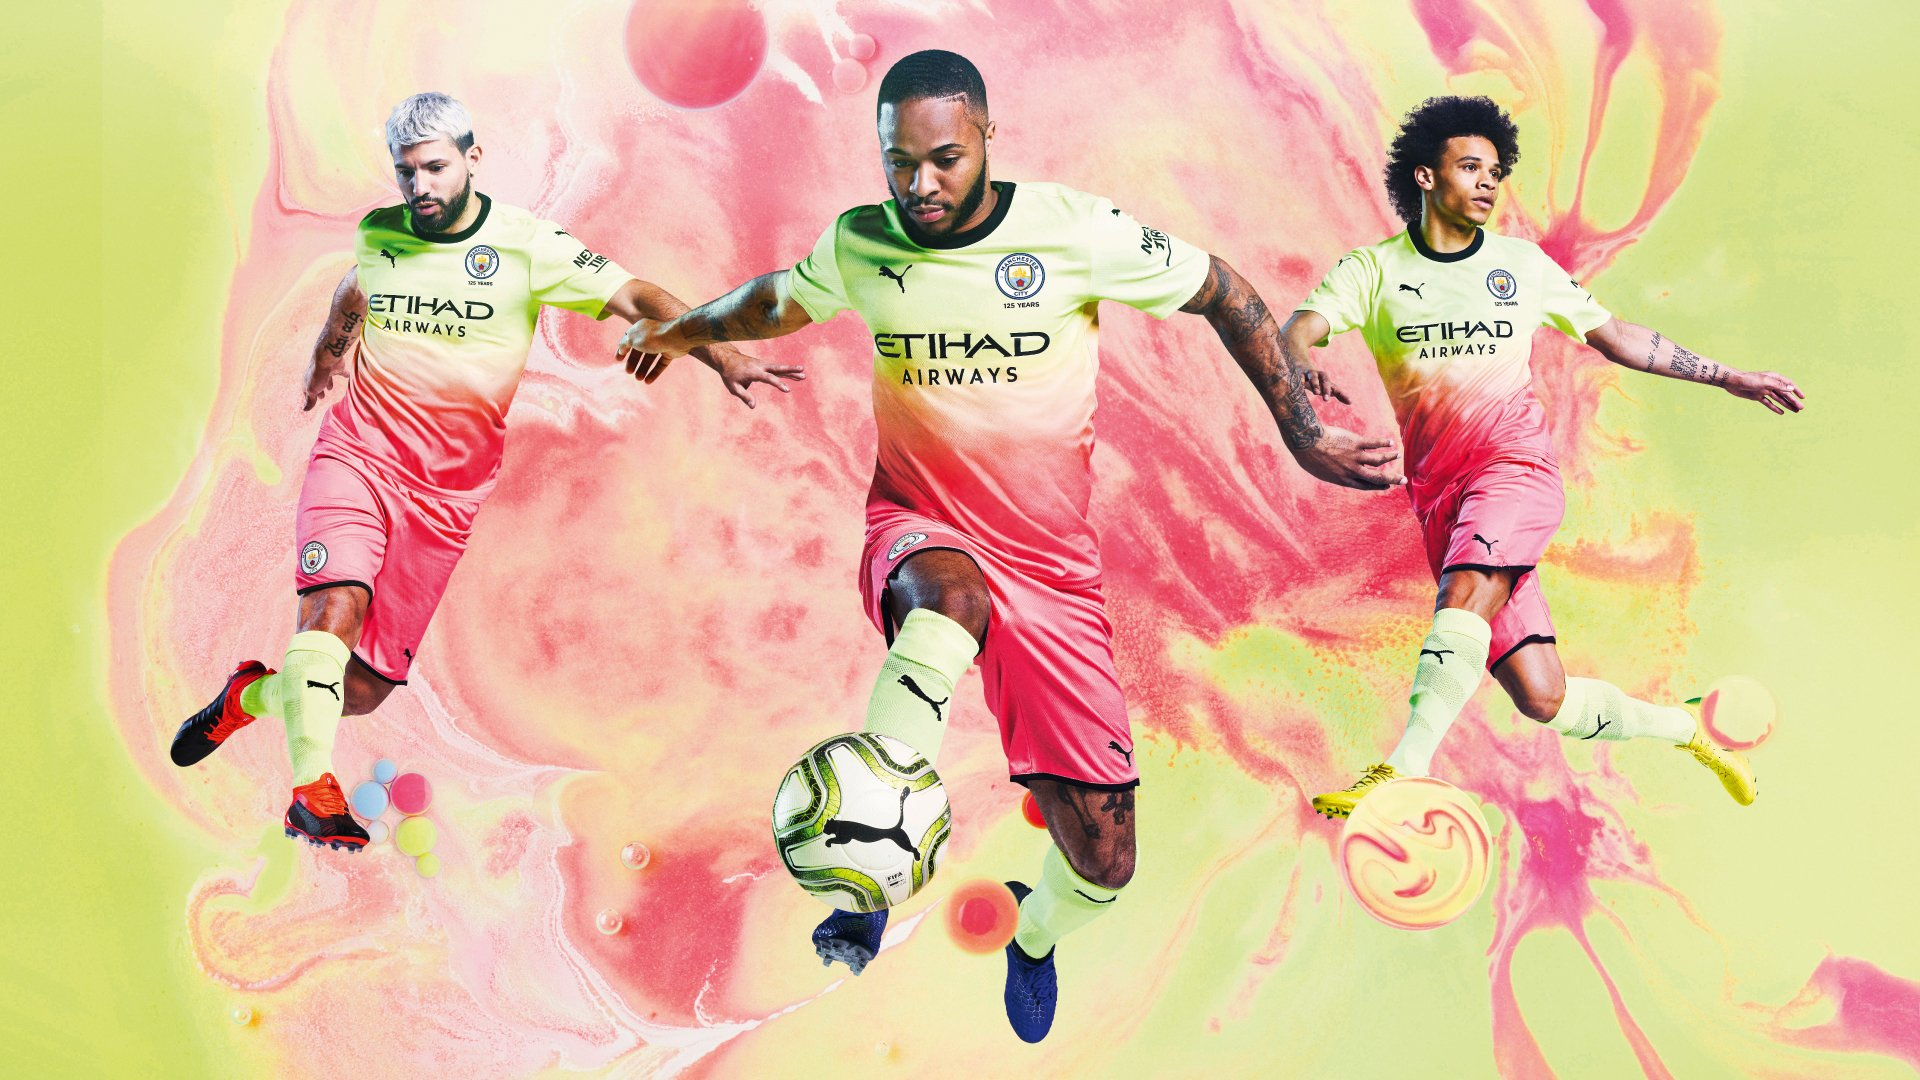 منچسترسیتی-Manchester City